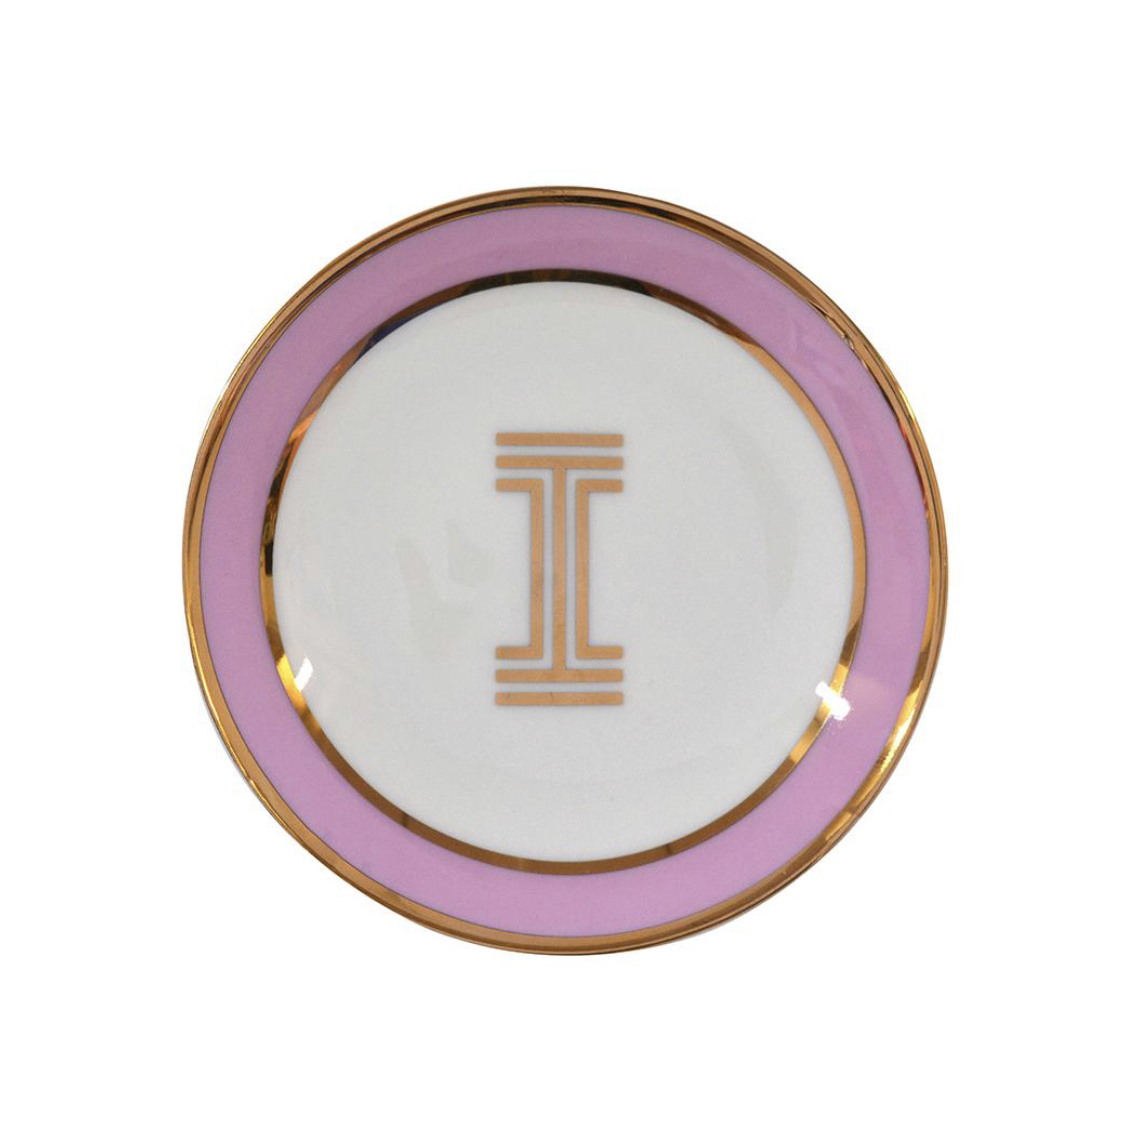 Bombay Duck Alphabet Trinket Dish - I